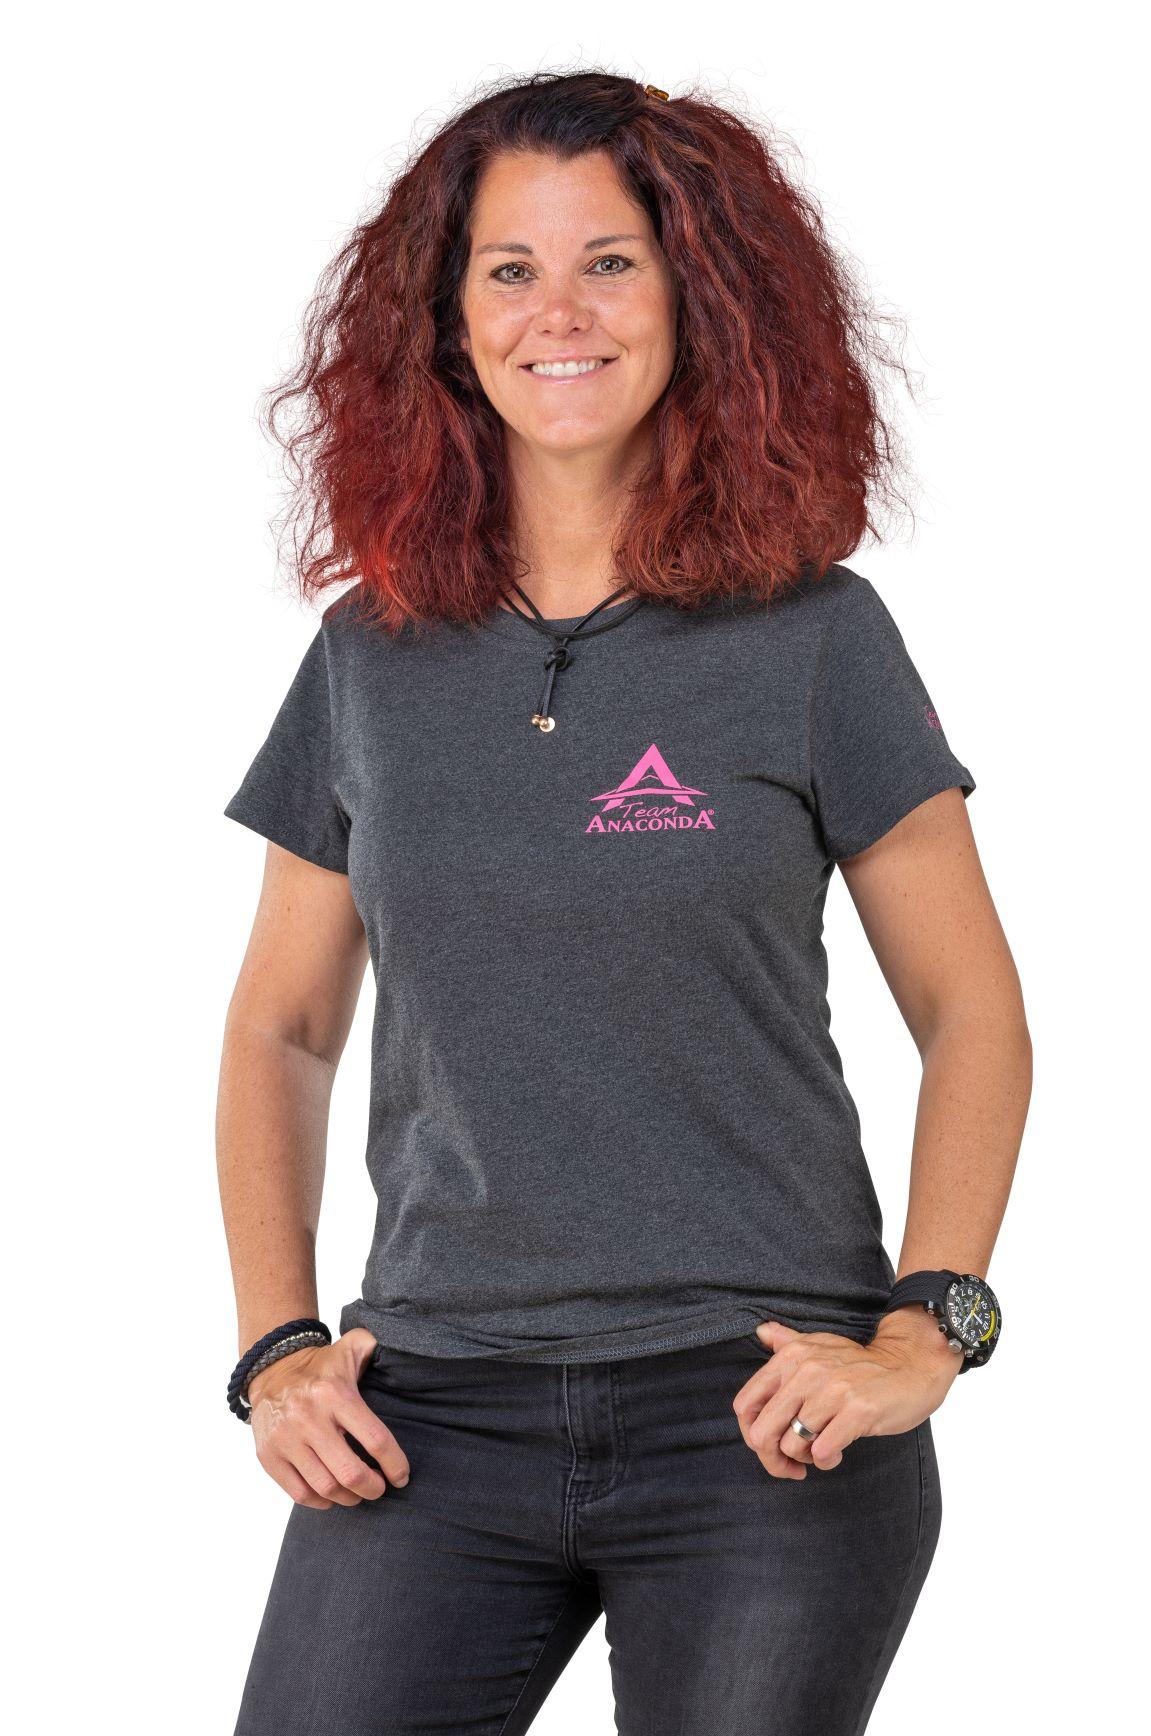 Anaconda dámské tričko Lady Team XL